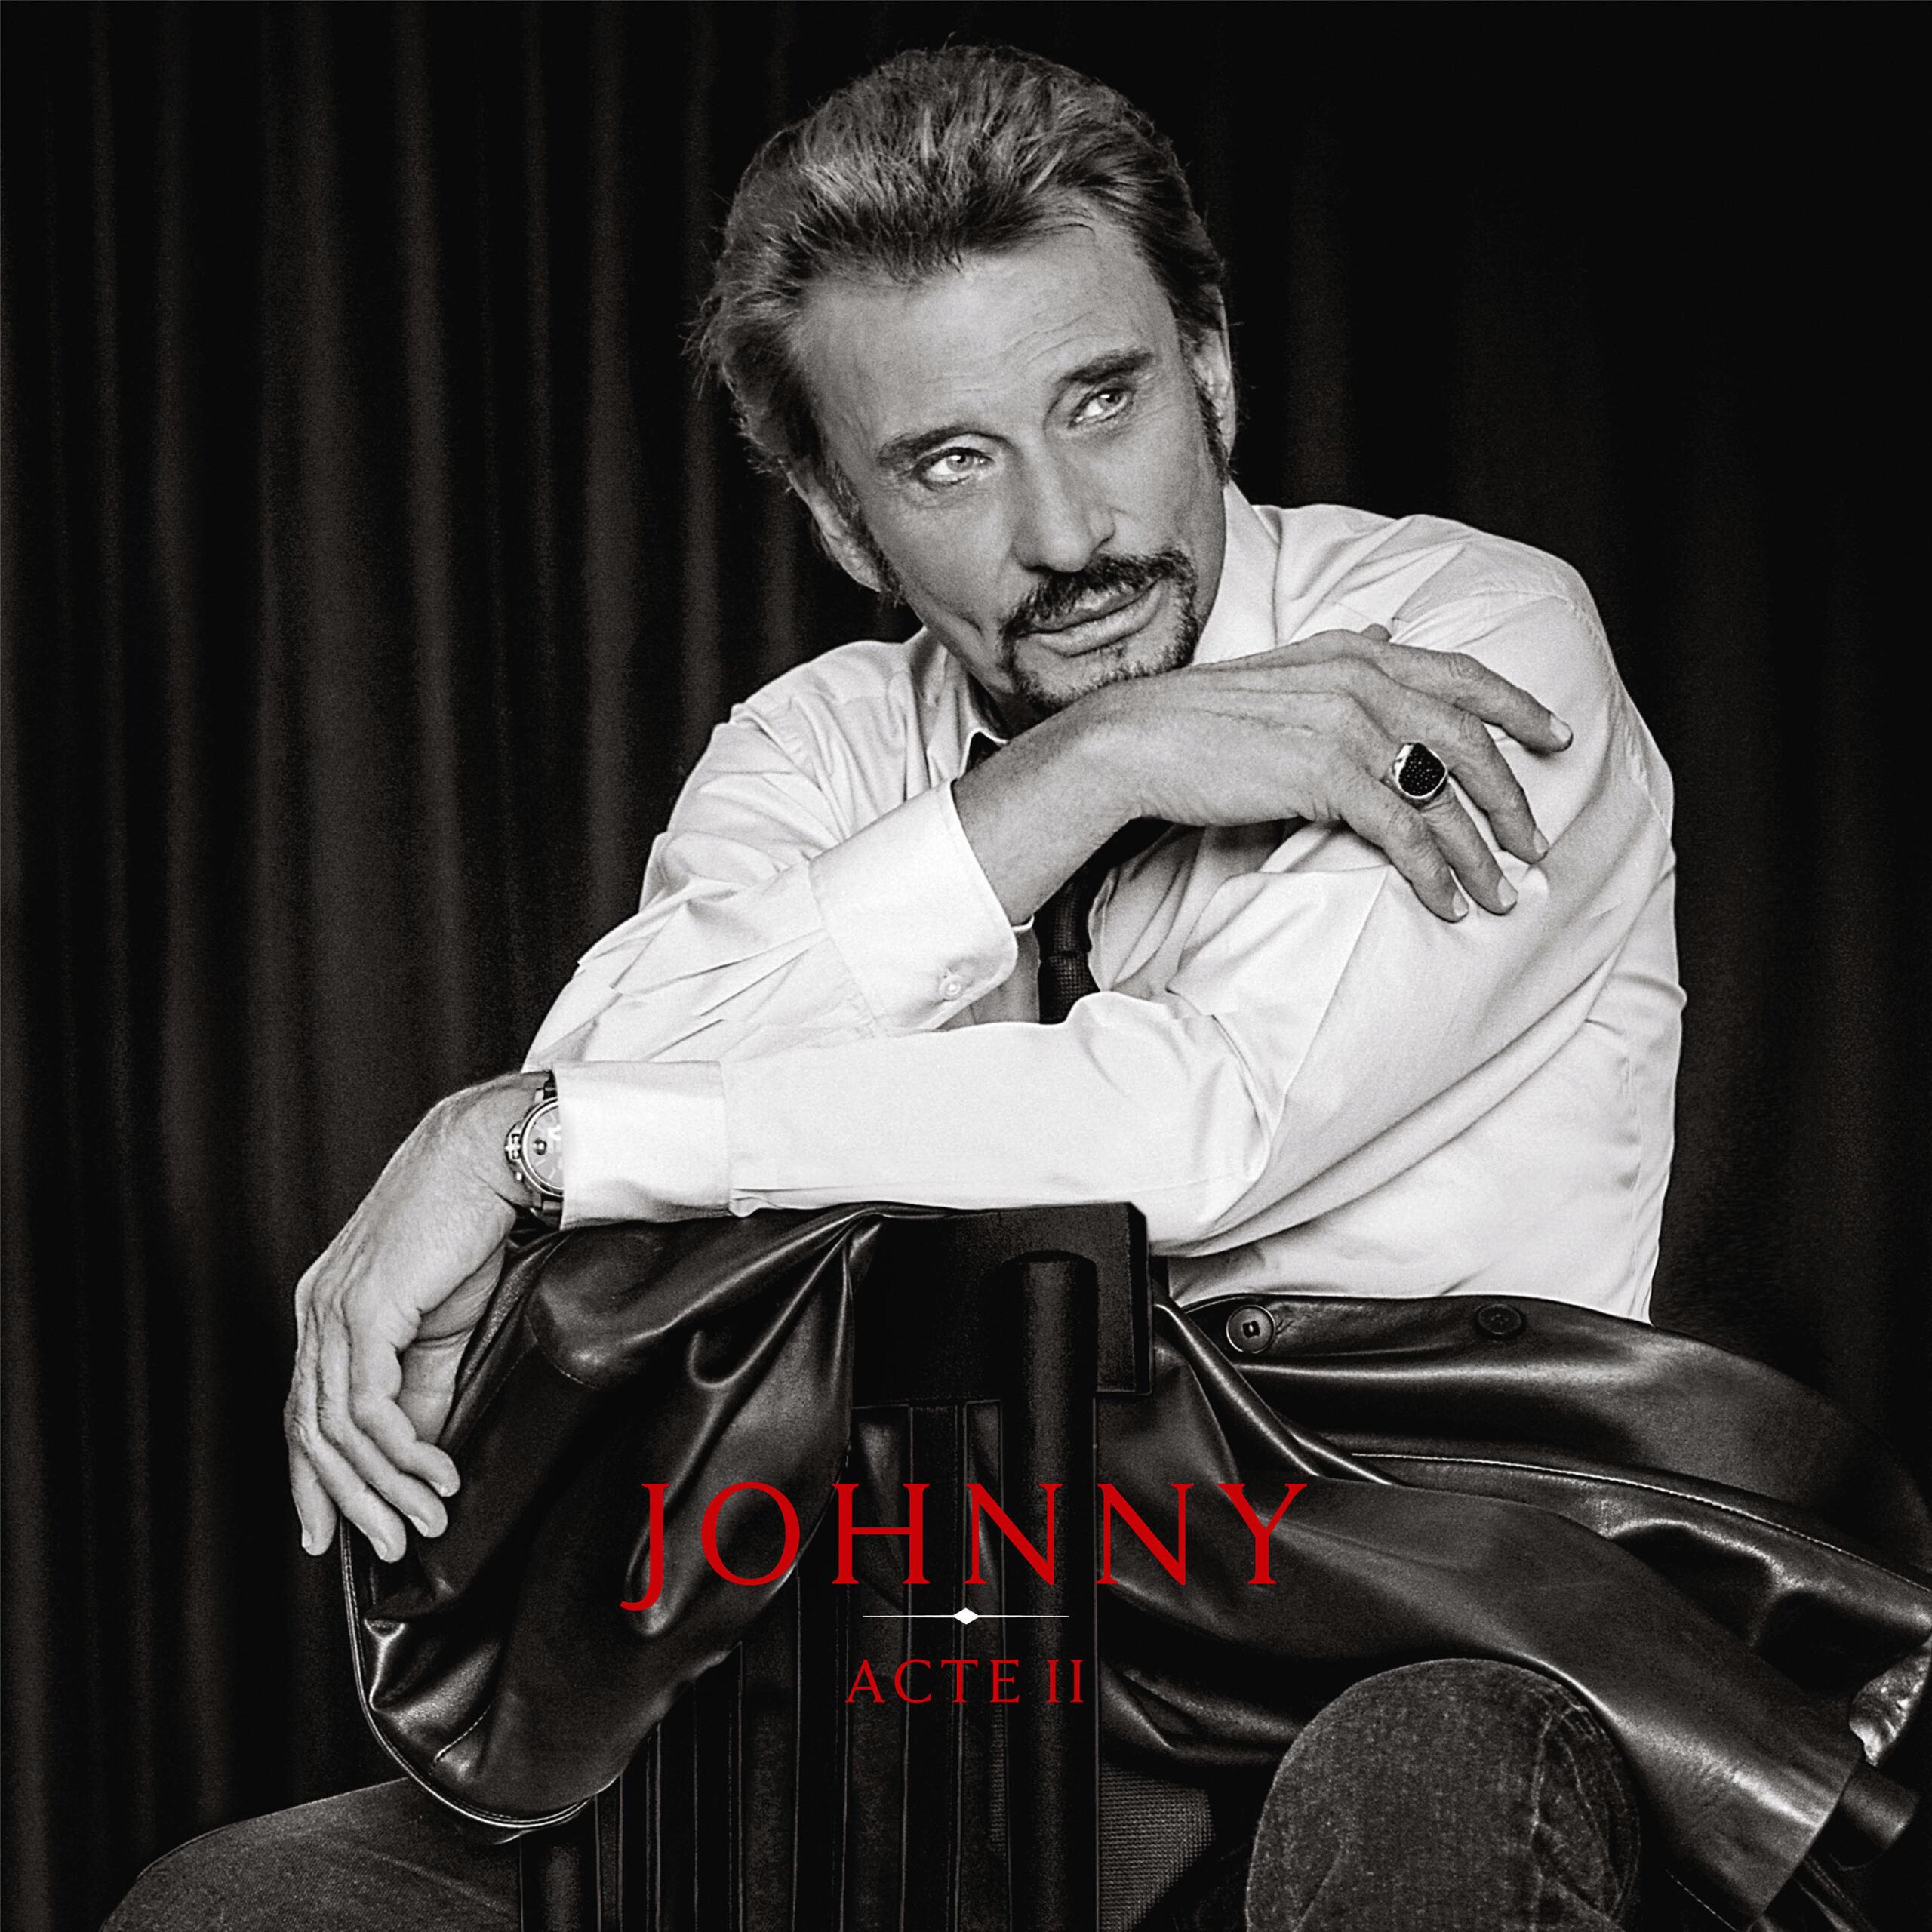 Visuel de l'Acte II Johnny45